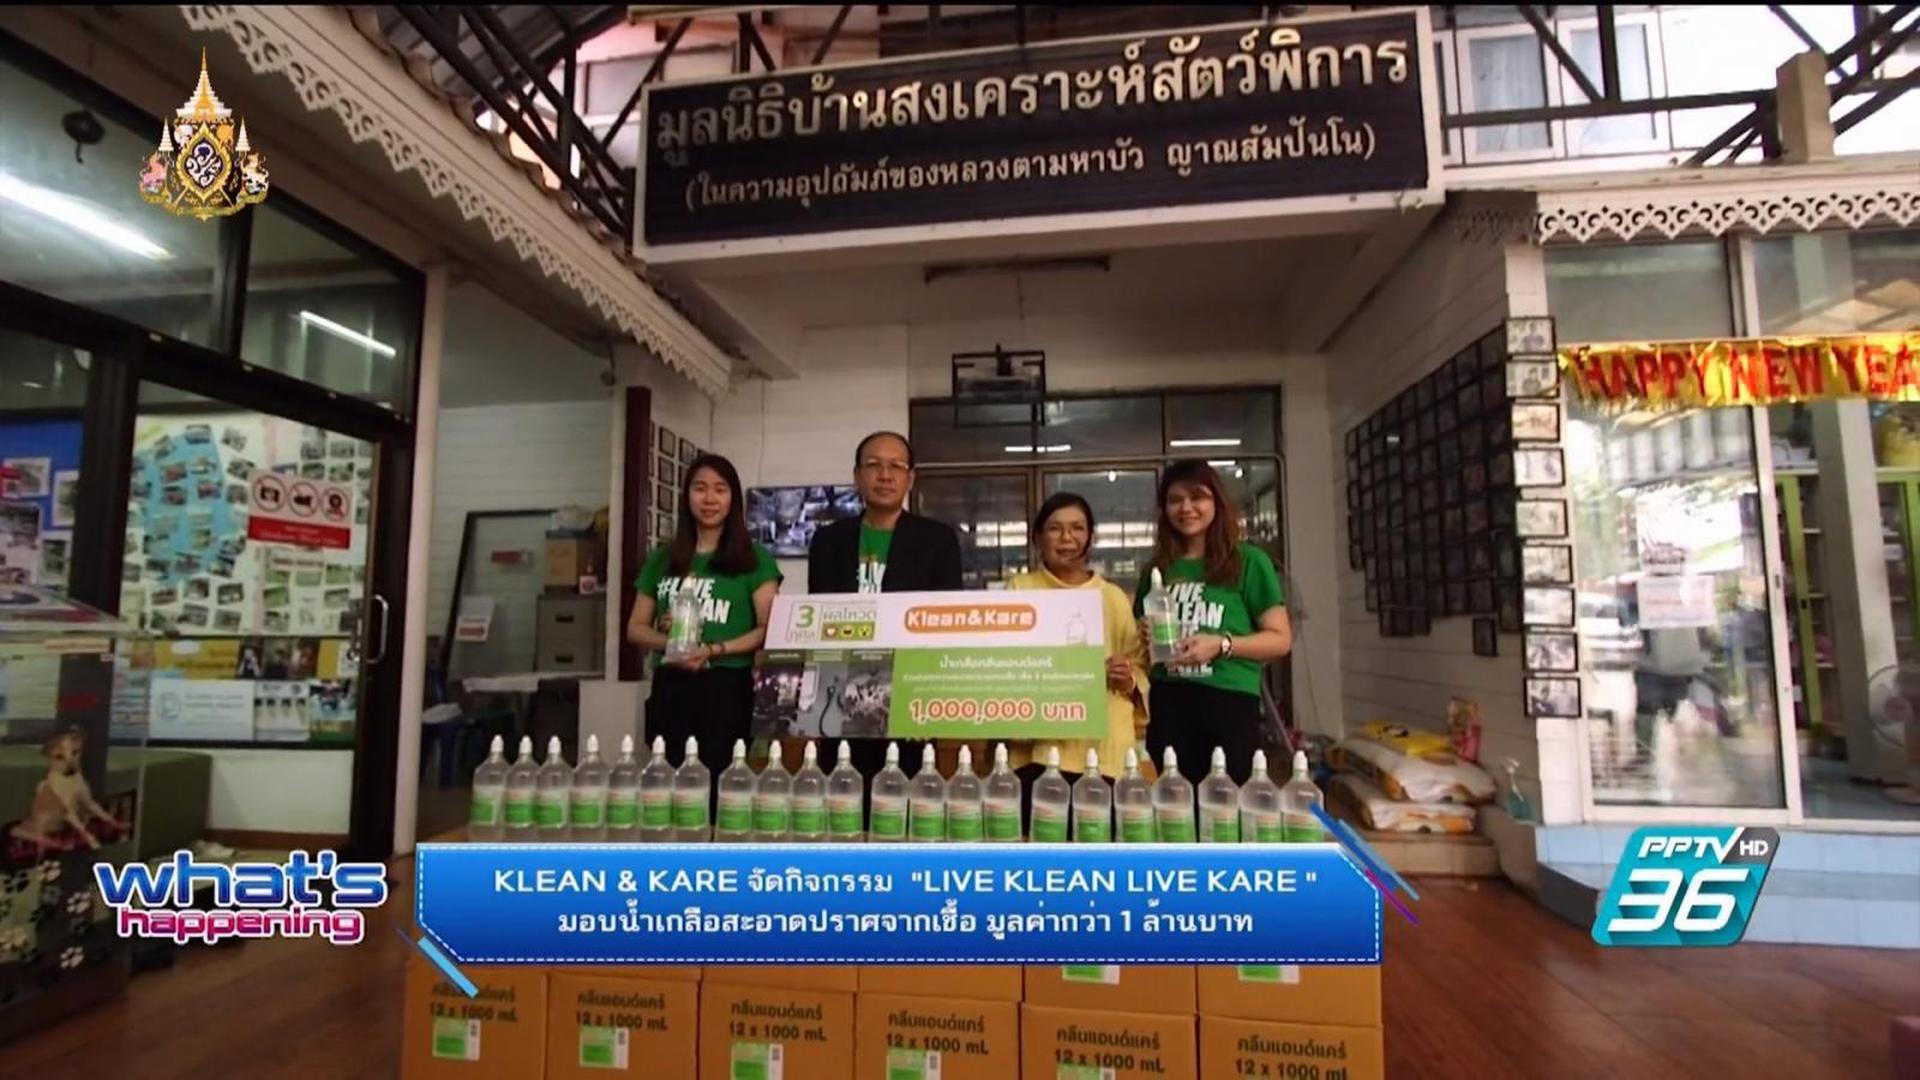 "KLEAN & KARE จัดกิจกรรม ""LIVE KLEAN LIVE KARE"" ให้กับ 3 องค์กรกุศล"